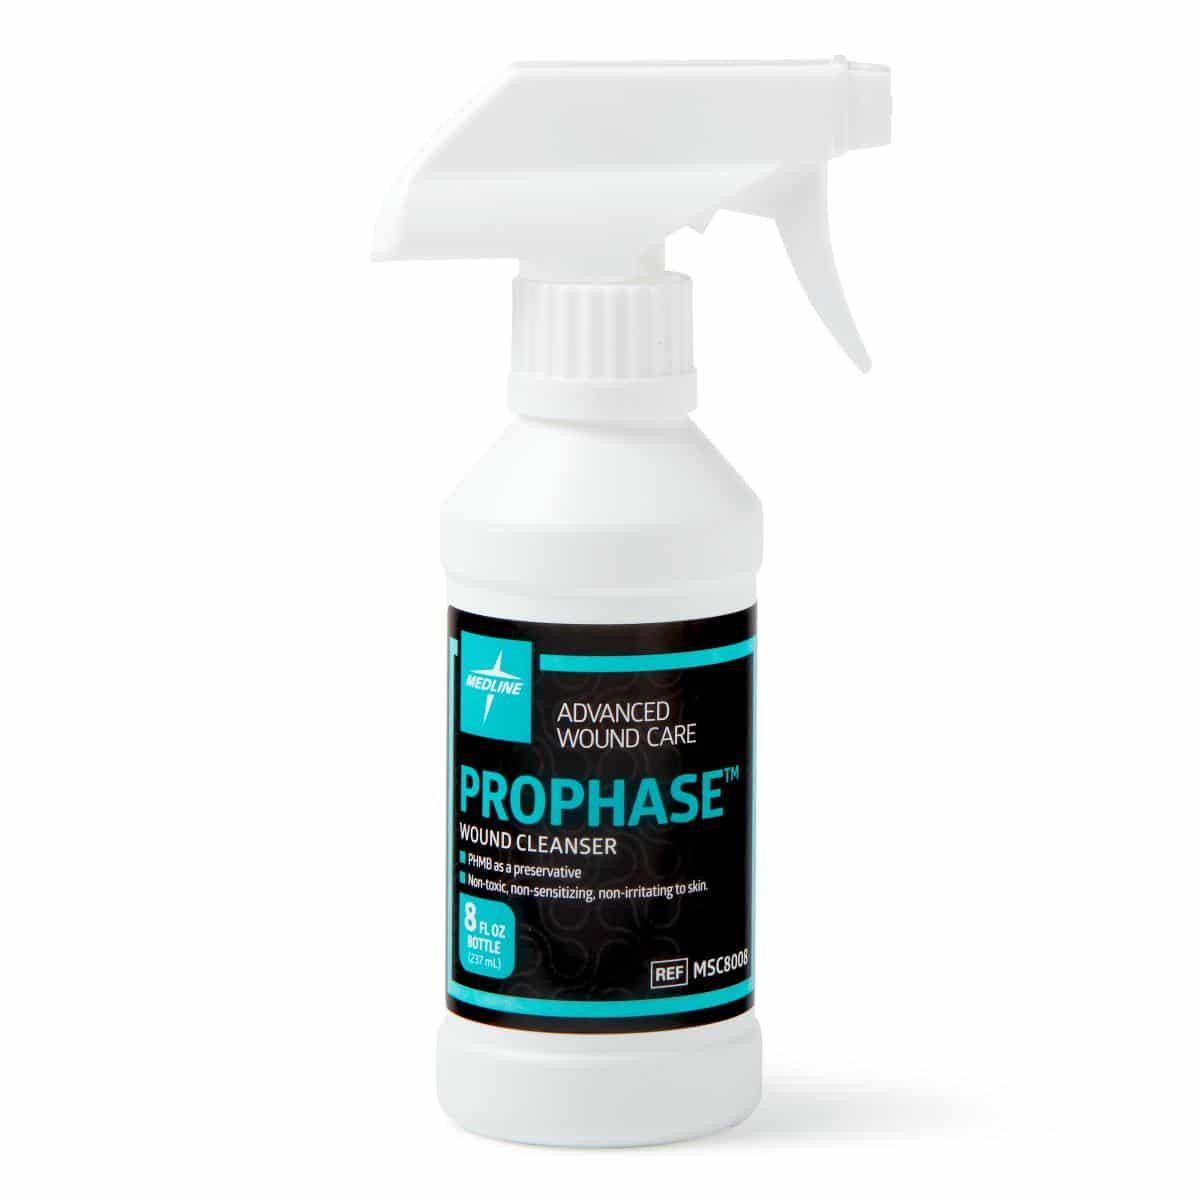 Medline MSC8008 Prophase Wound Cleanser Canada